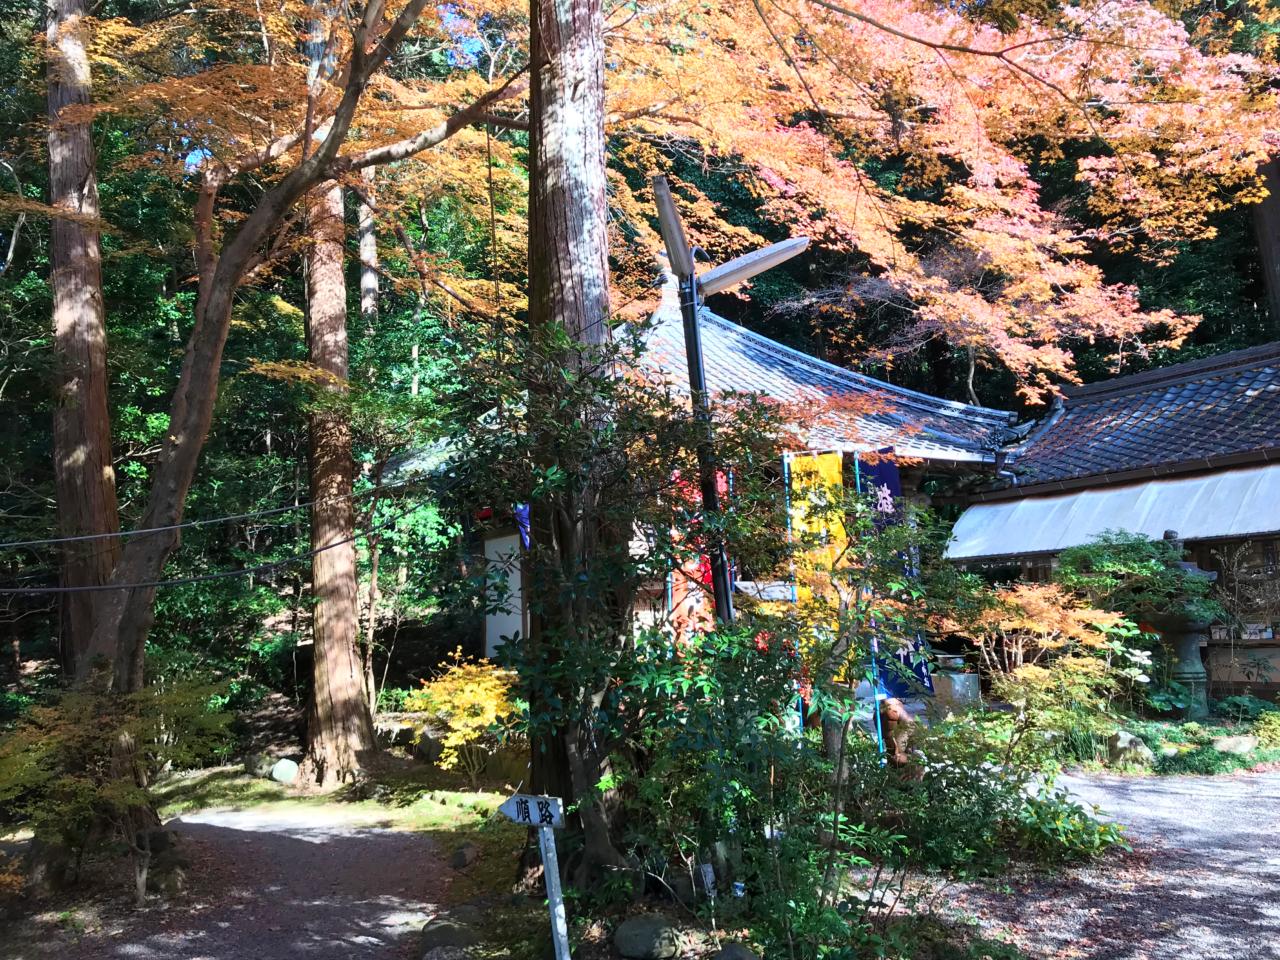 赤山禅院の紅葉 七福神付近